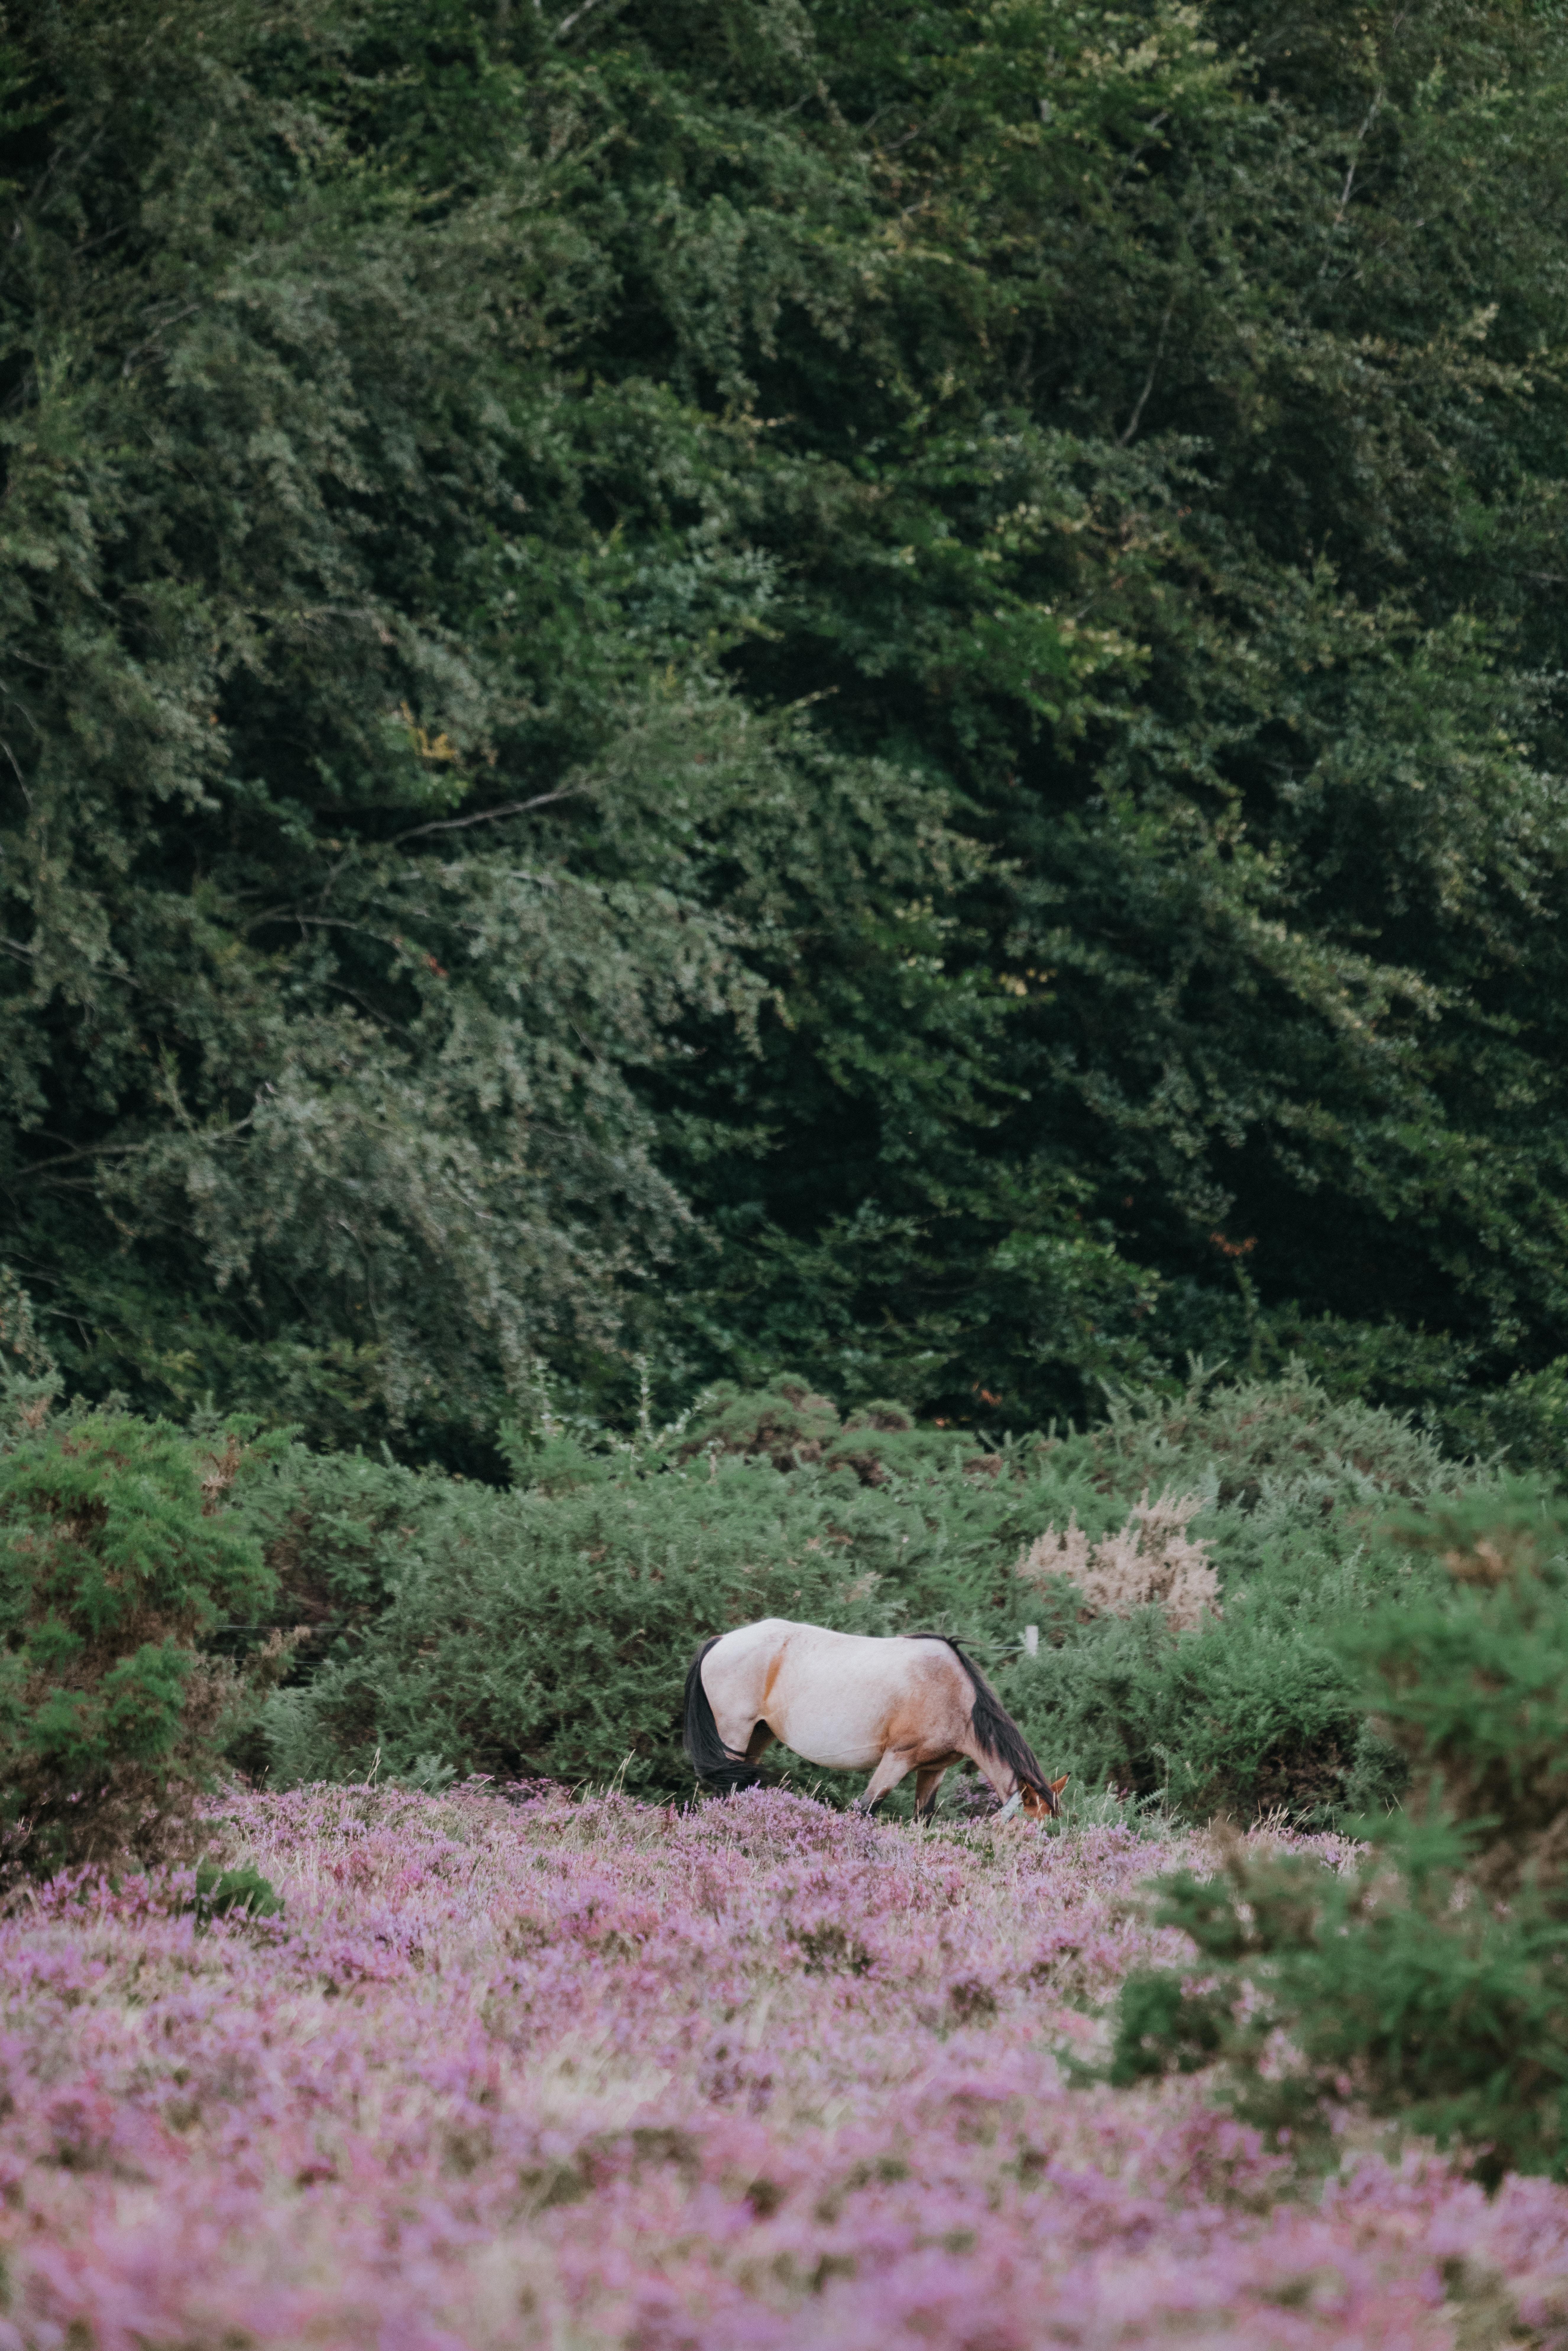 beige horse standing on grass field